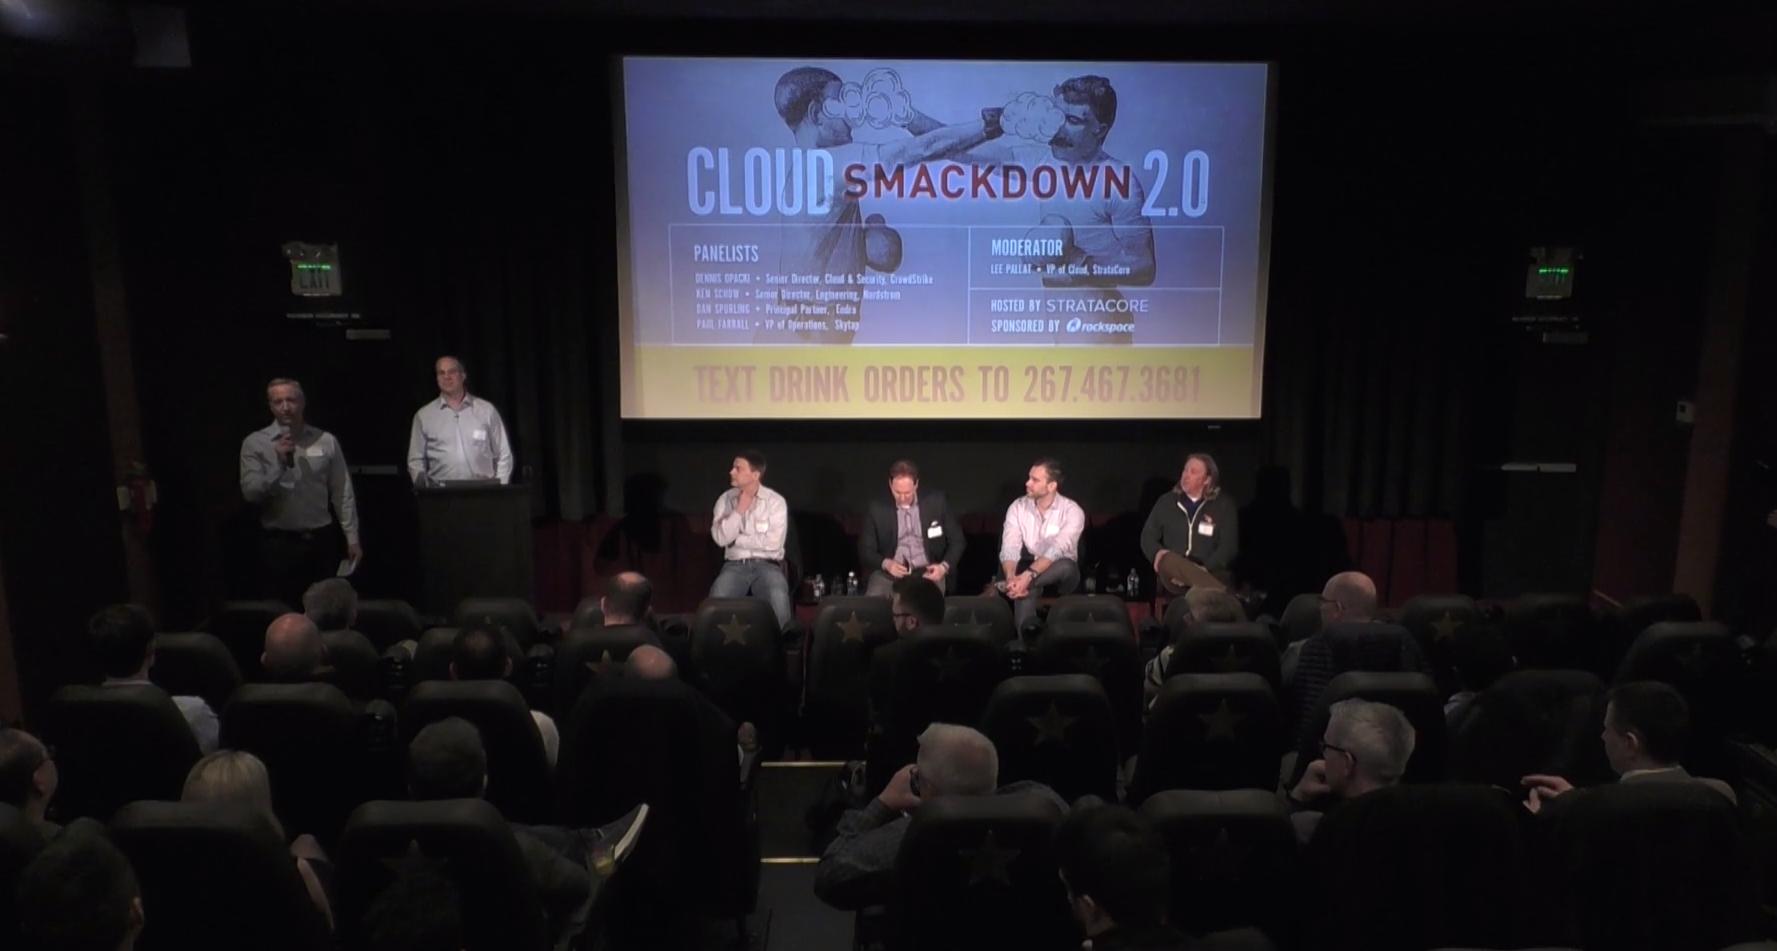 Cloud Smackdown 2.0